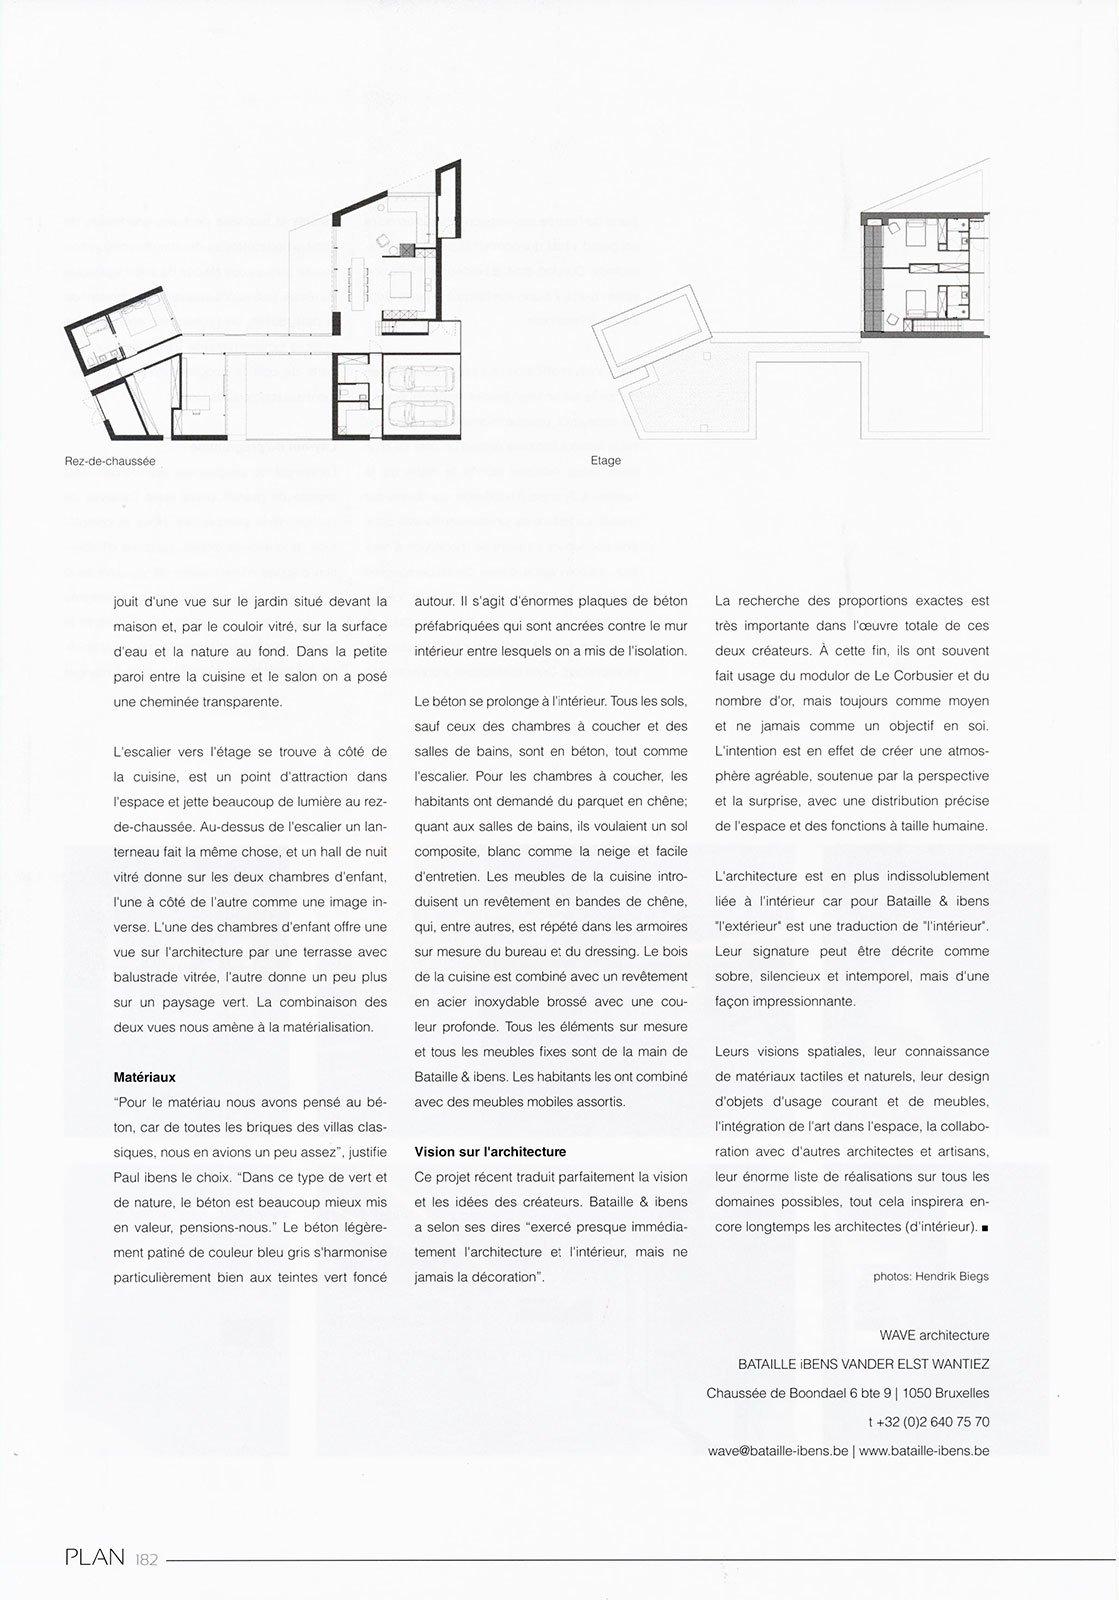 Plan Press Wave Architecture